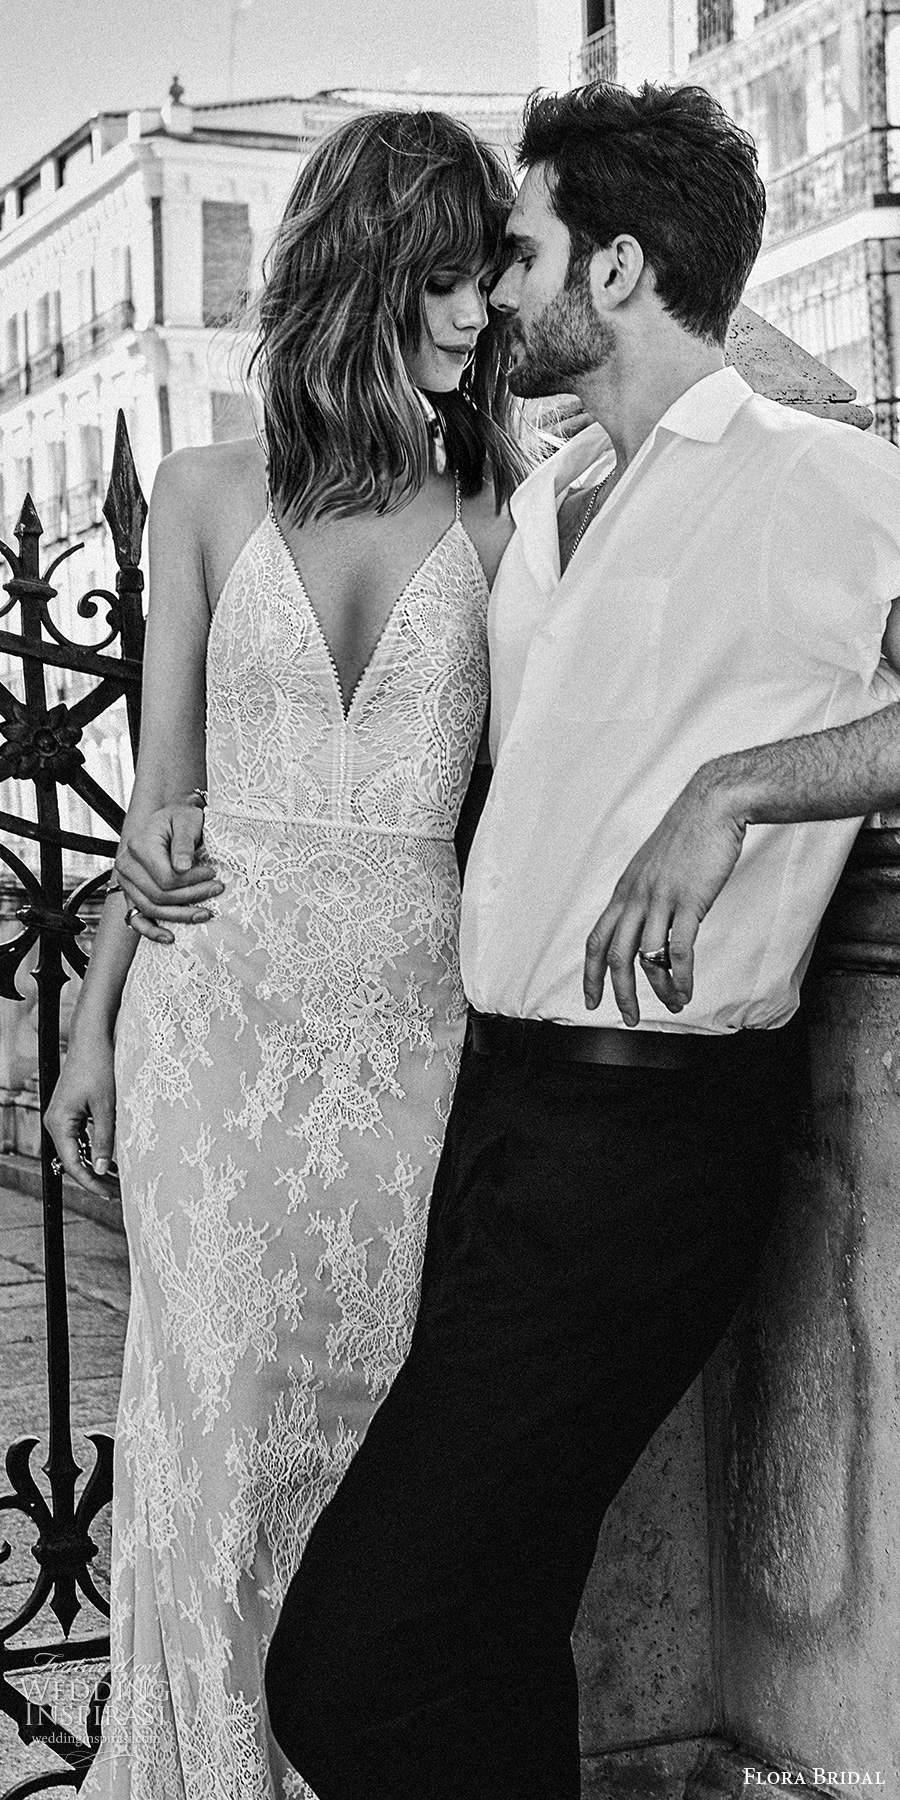 flora bridal 2020 bridal sleeveless thin straps plunging v neckline fully embellished lace sheath wedding dress chapel train (5) zv